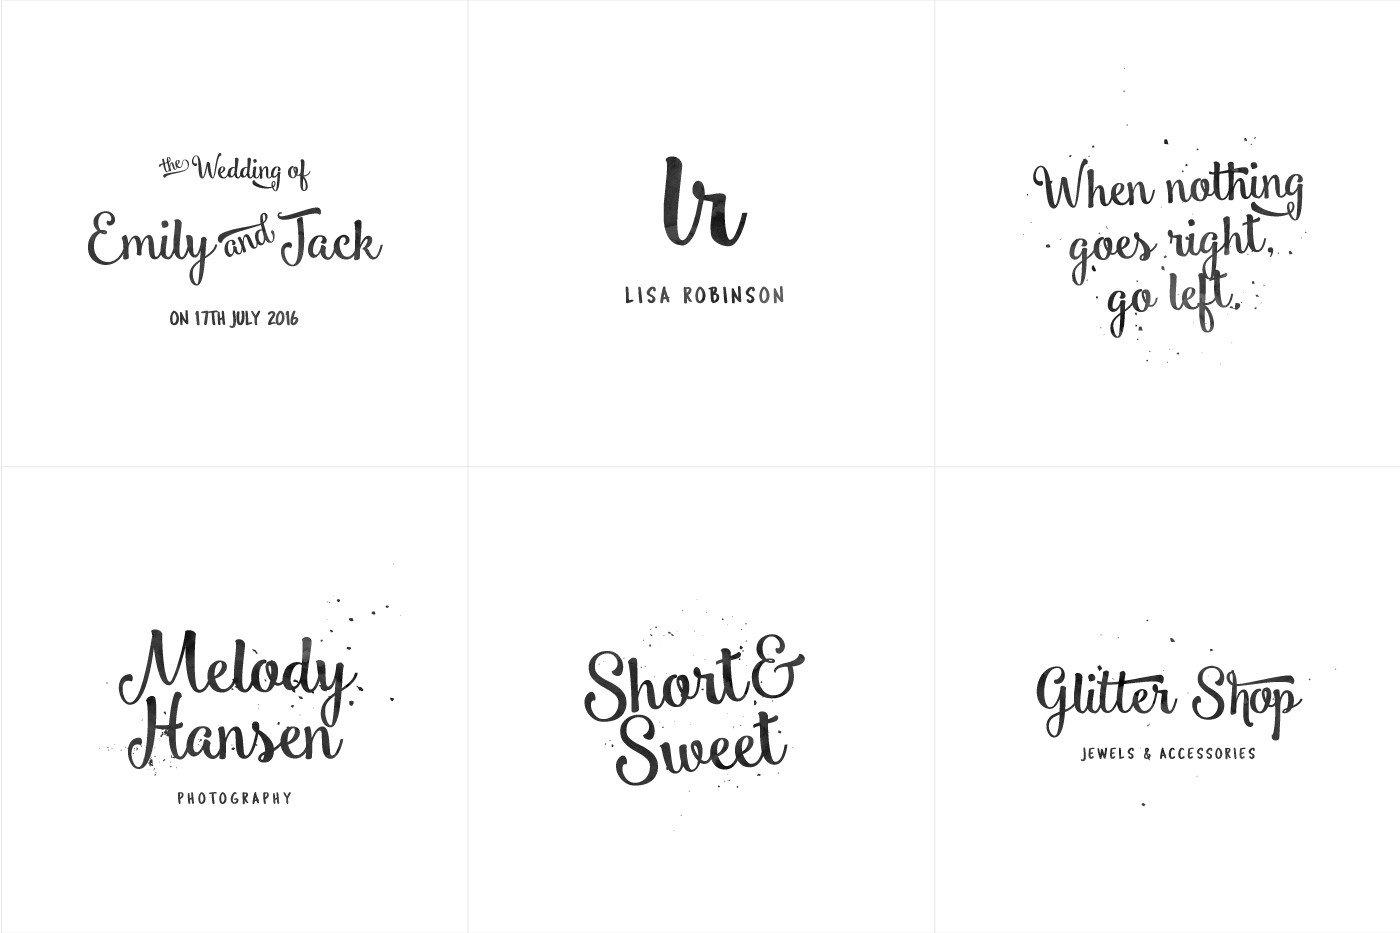 Smoothie-Shoppe-Free-Script-Font-Preview-06